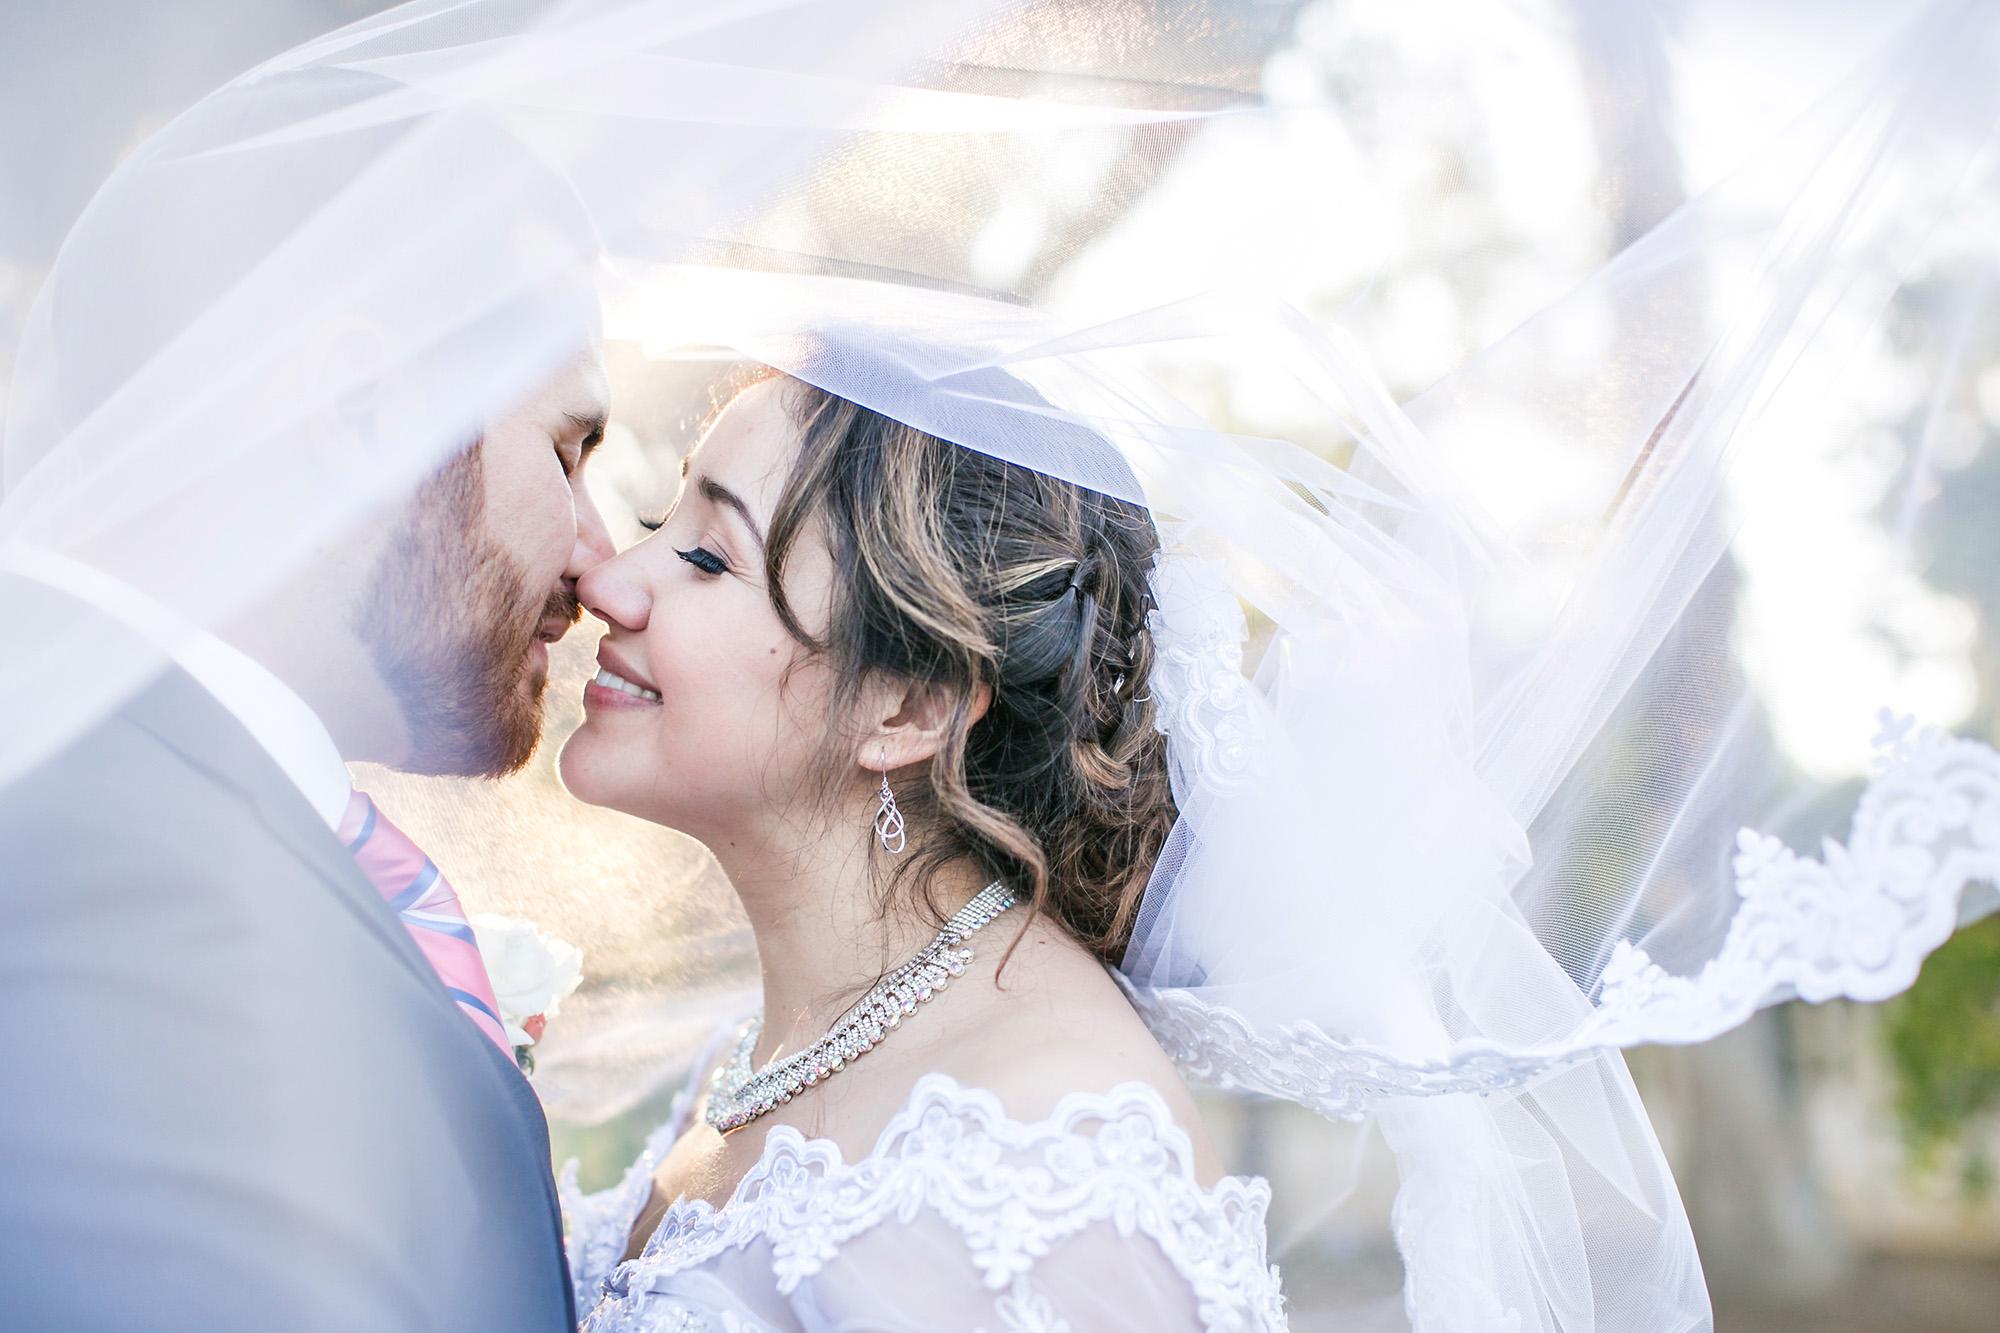 christmas-house-weddings-receptions-carrie-vines-270.jpg